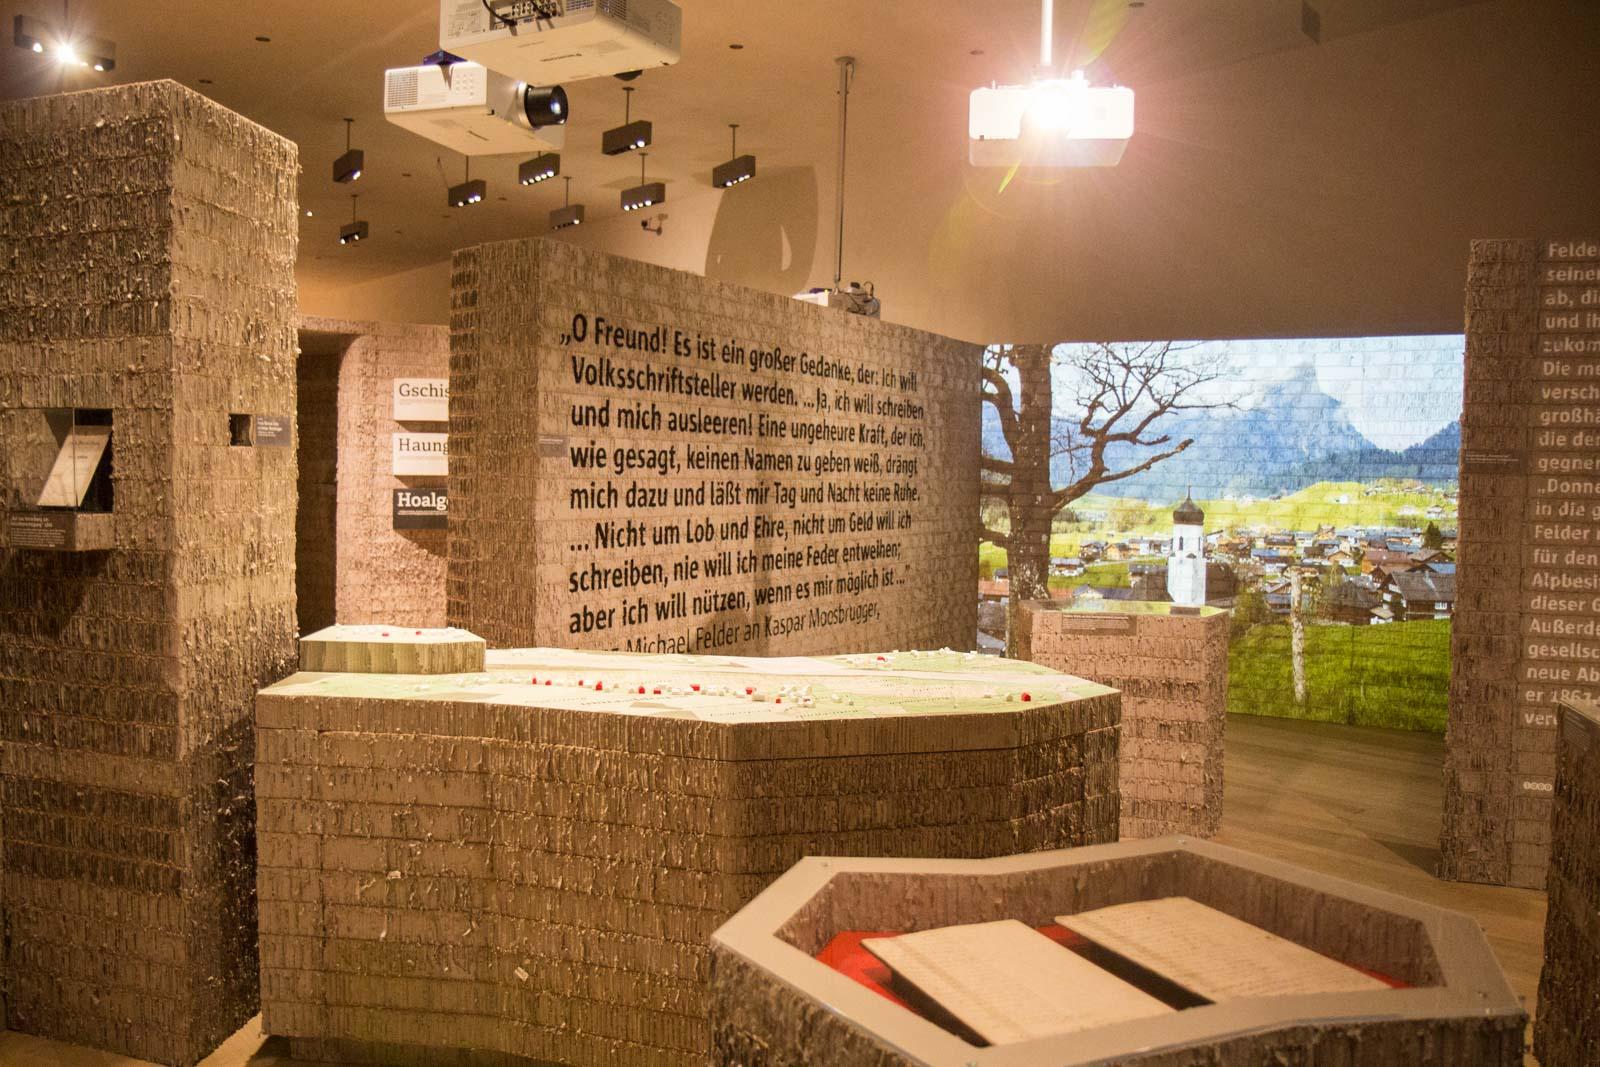 Vorarlberg Museum, Bregenz, Austria